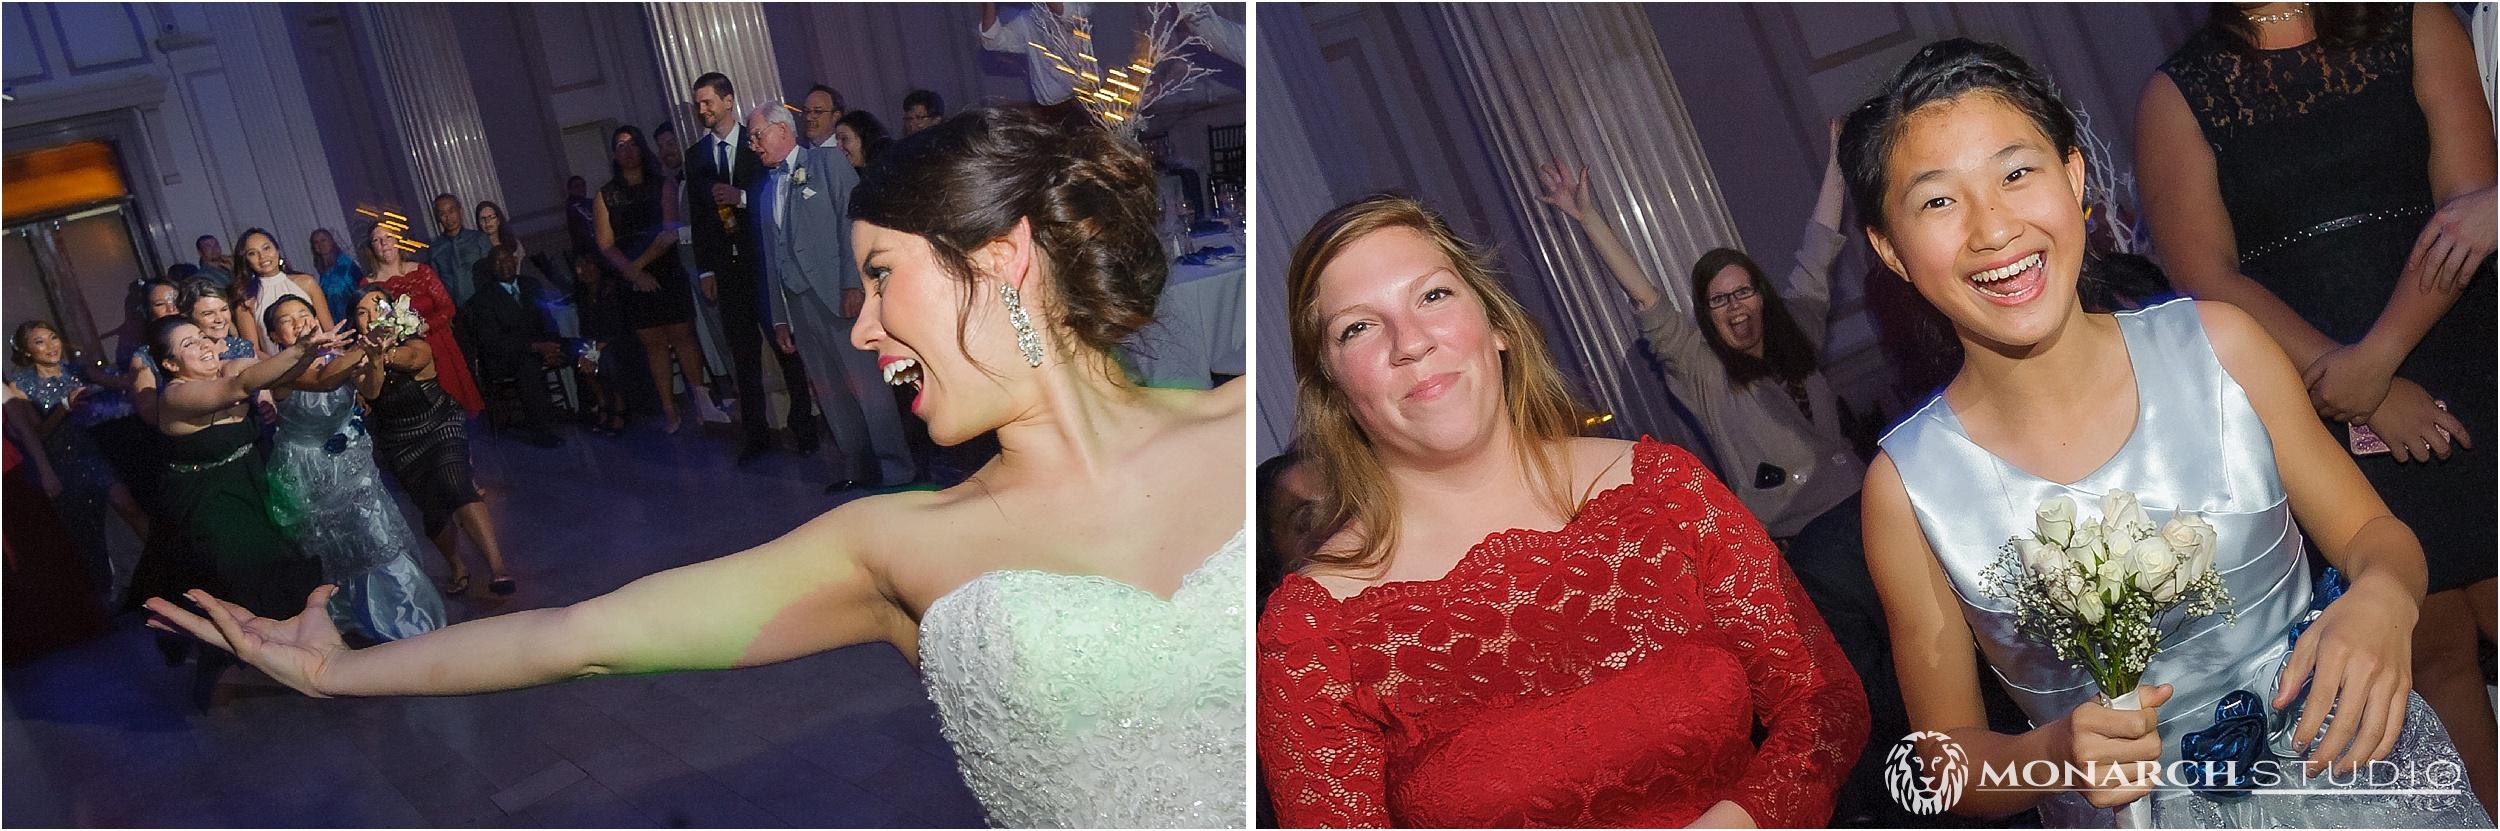 wedding-photographer-in-st-augustine-florida-treasury-117.jpg